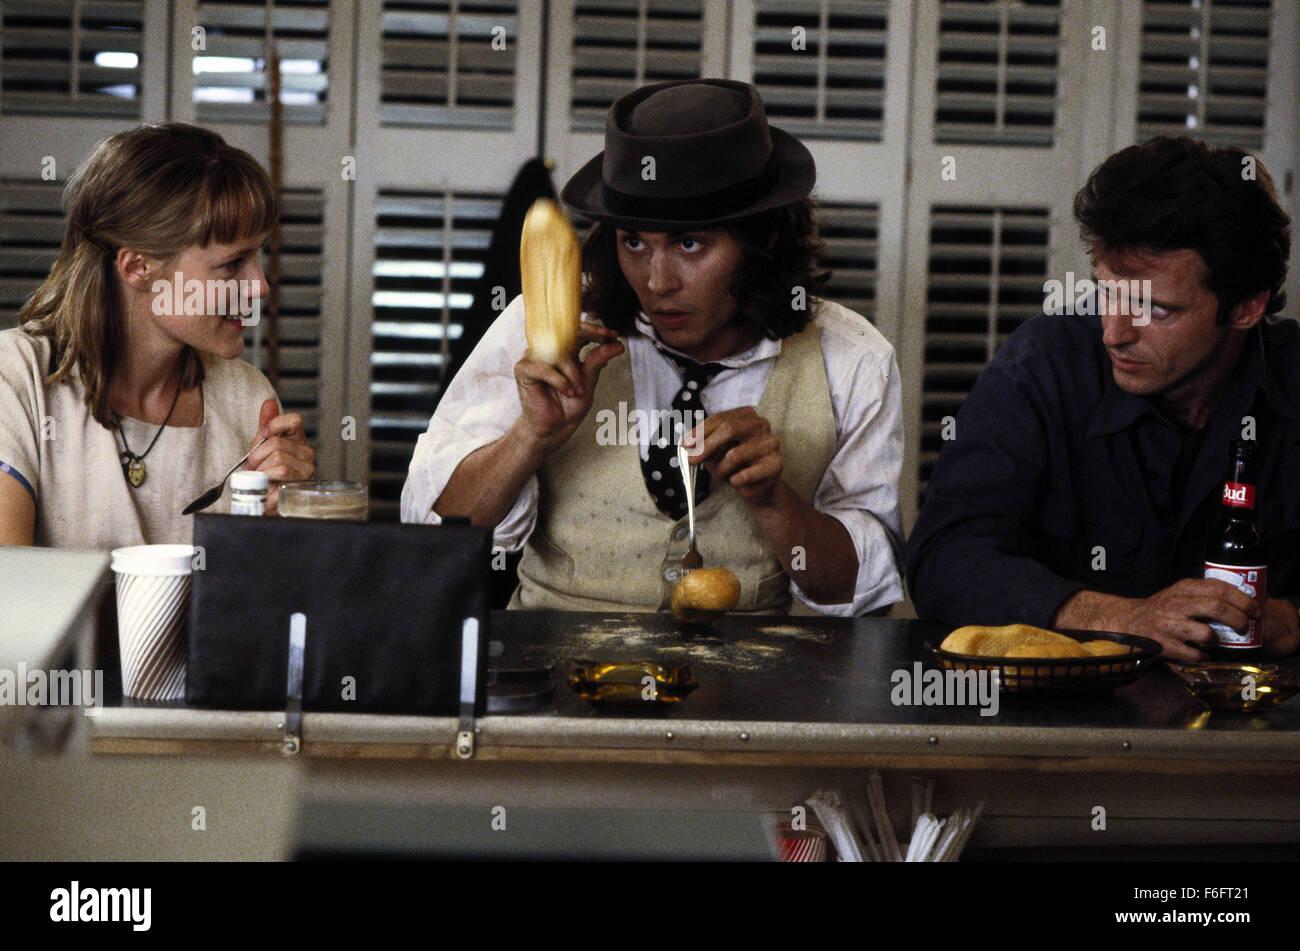 Apr 16, 1993; Spokane, WA, USA; (left to right) MARY STUART MASTERSON as Juniper 'Joon' Pearl, JOHNNY DEPP as Sam, Stock Photo